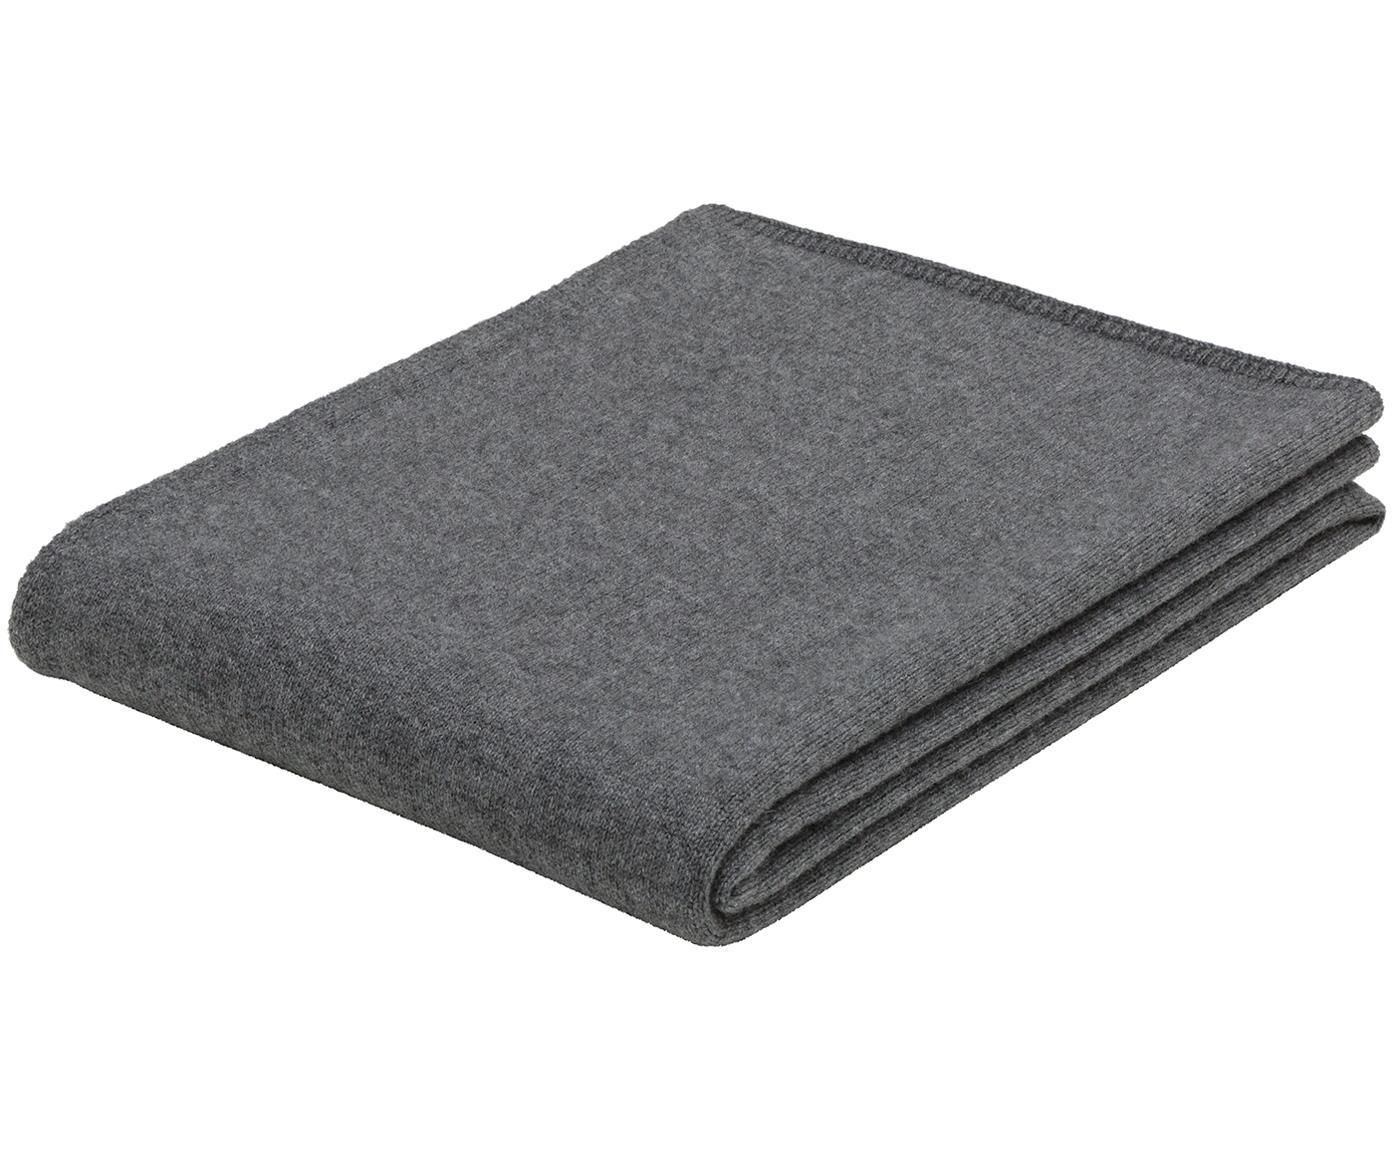 Manta de cachemira finamente tejida Viviana, 70%cachemira, 30%lana merino, Gris oscuro, An 130 x L 170 cm